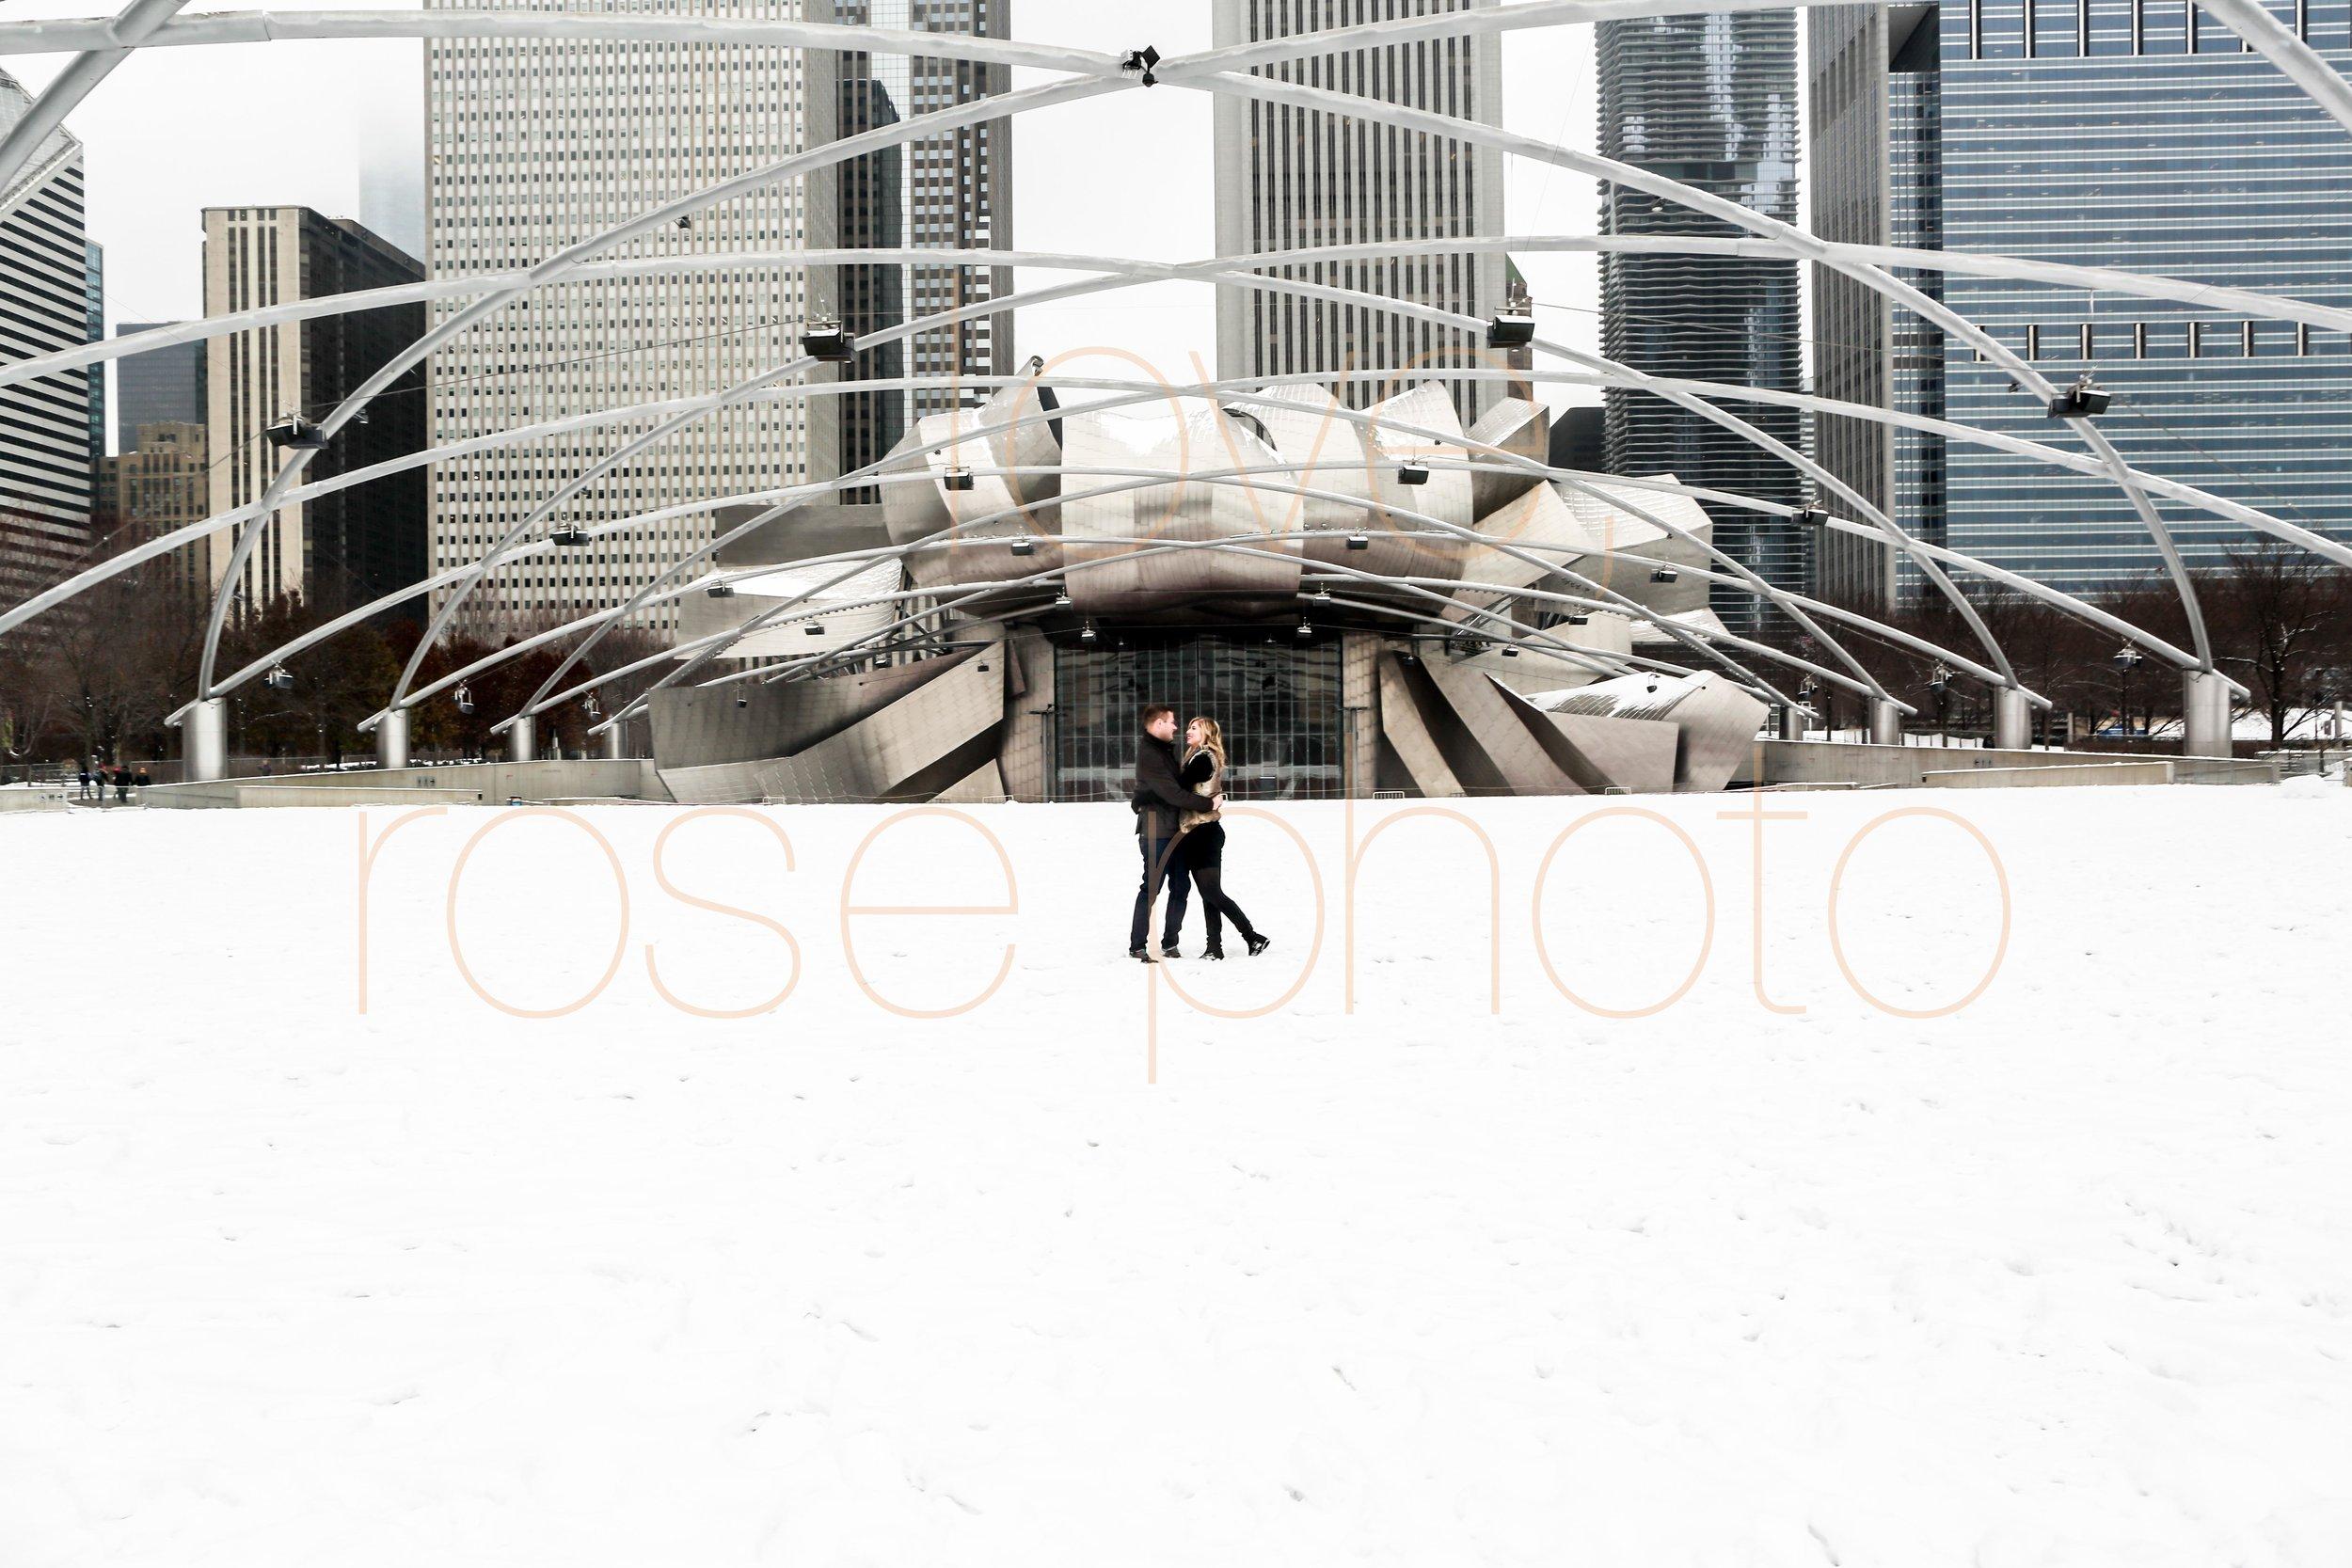 Rose Photo custom engagment shoot downtown chicago best wedding photographer-9.jpg